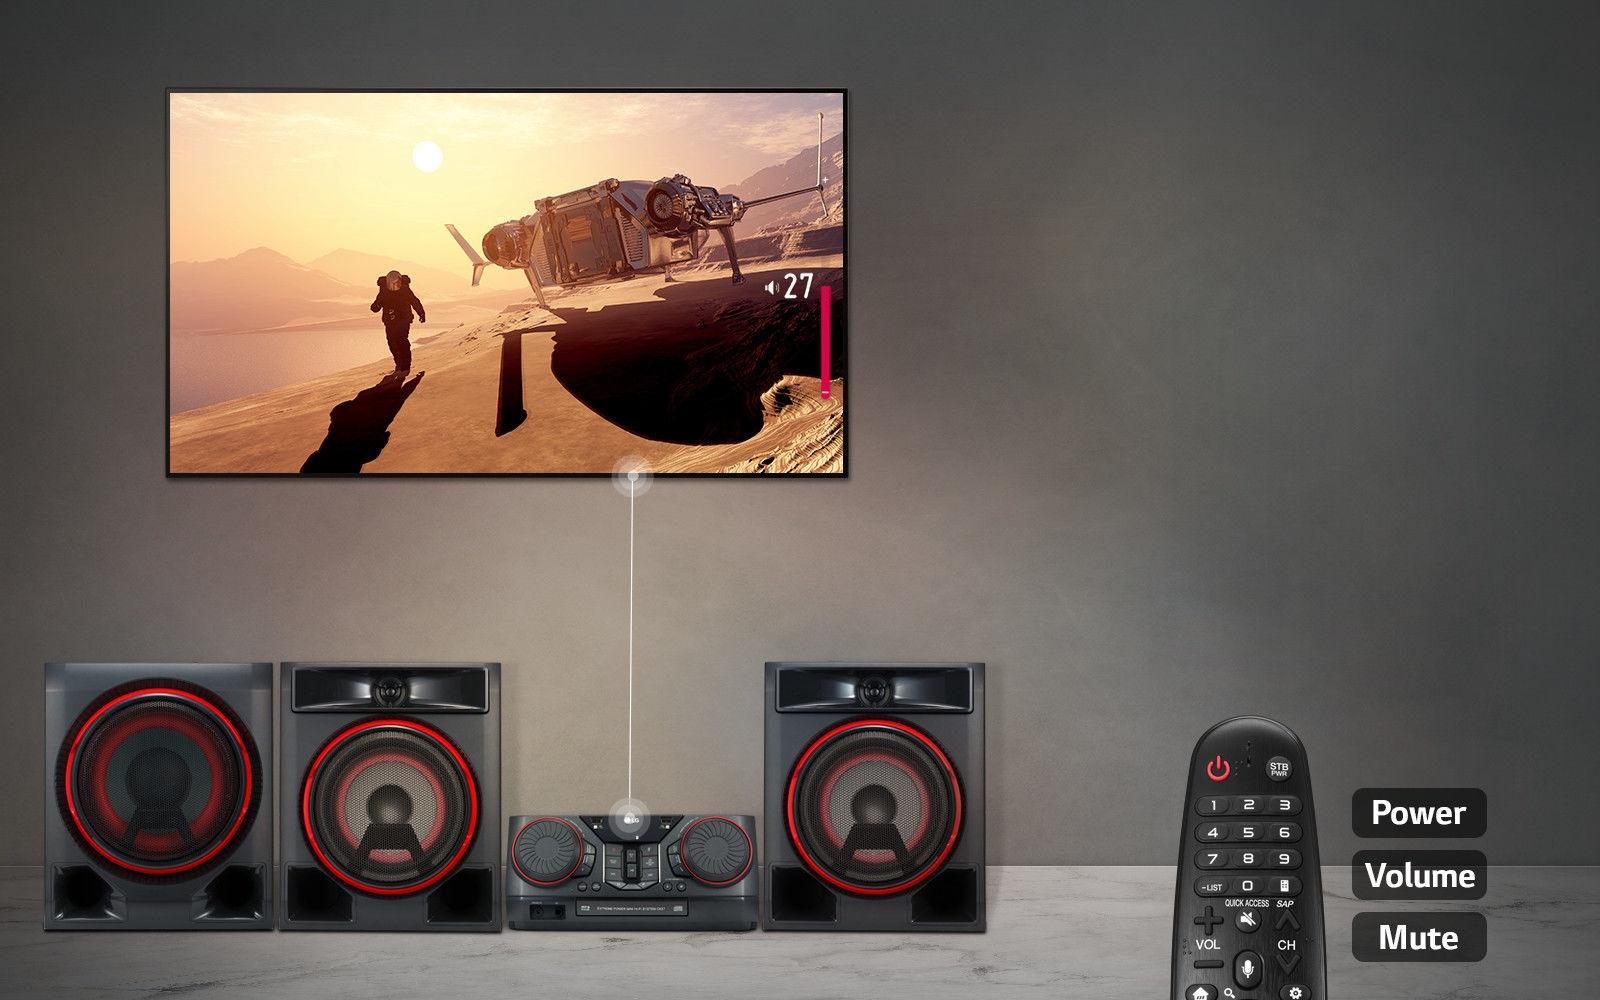 06_CK57_TV_Sound_Sync_Desktop